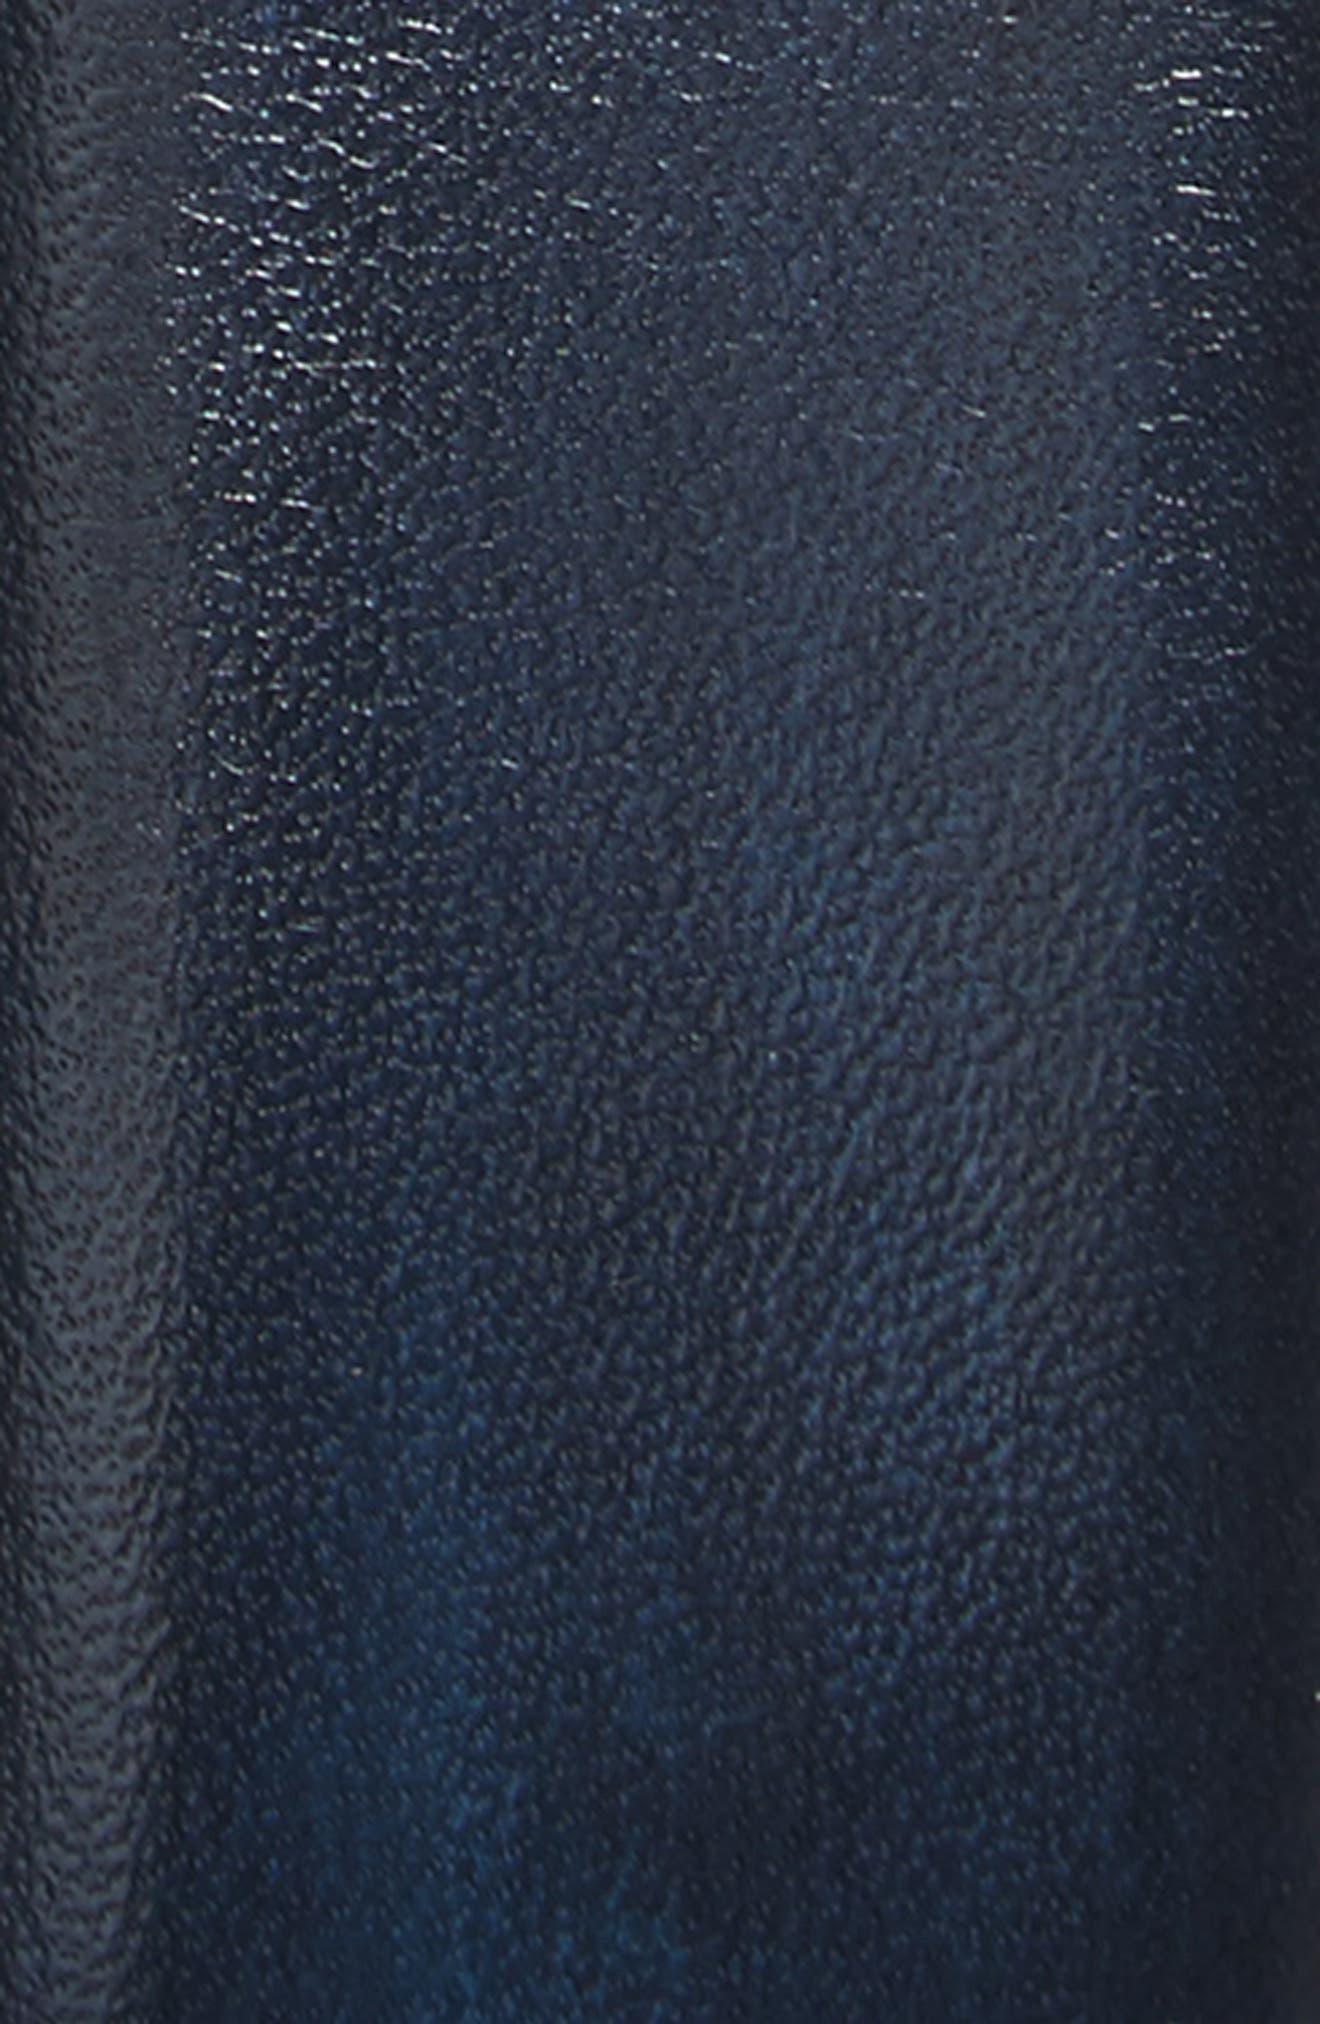 Bolton Leather Belt,                             Alternate thumbnail 2, color,                             410